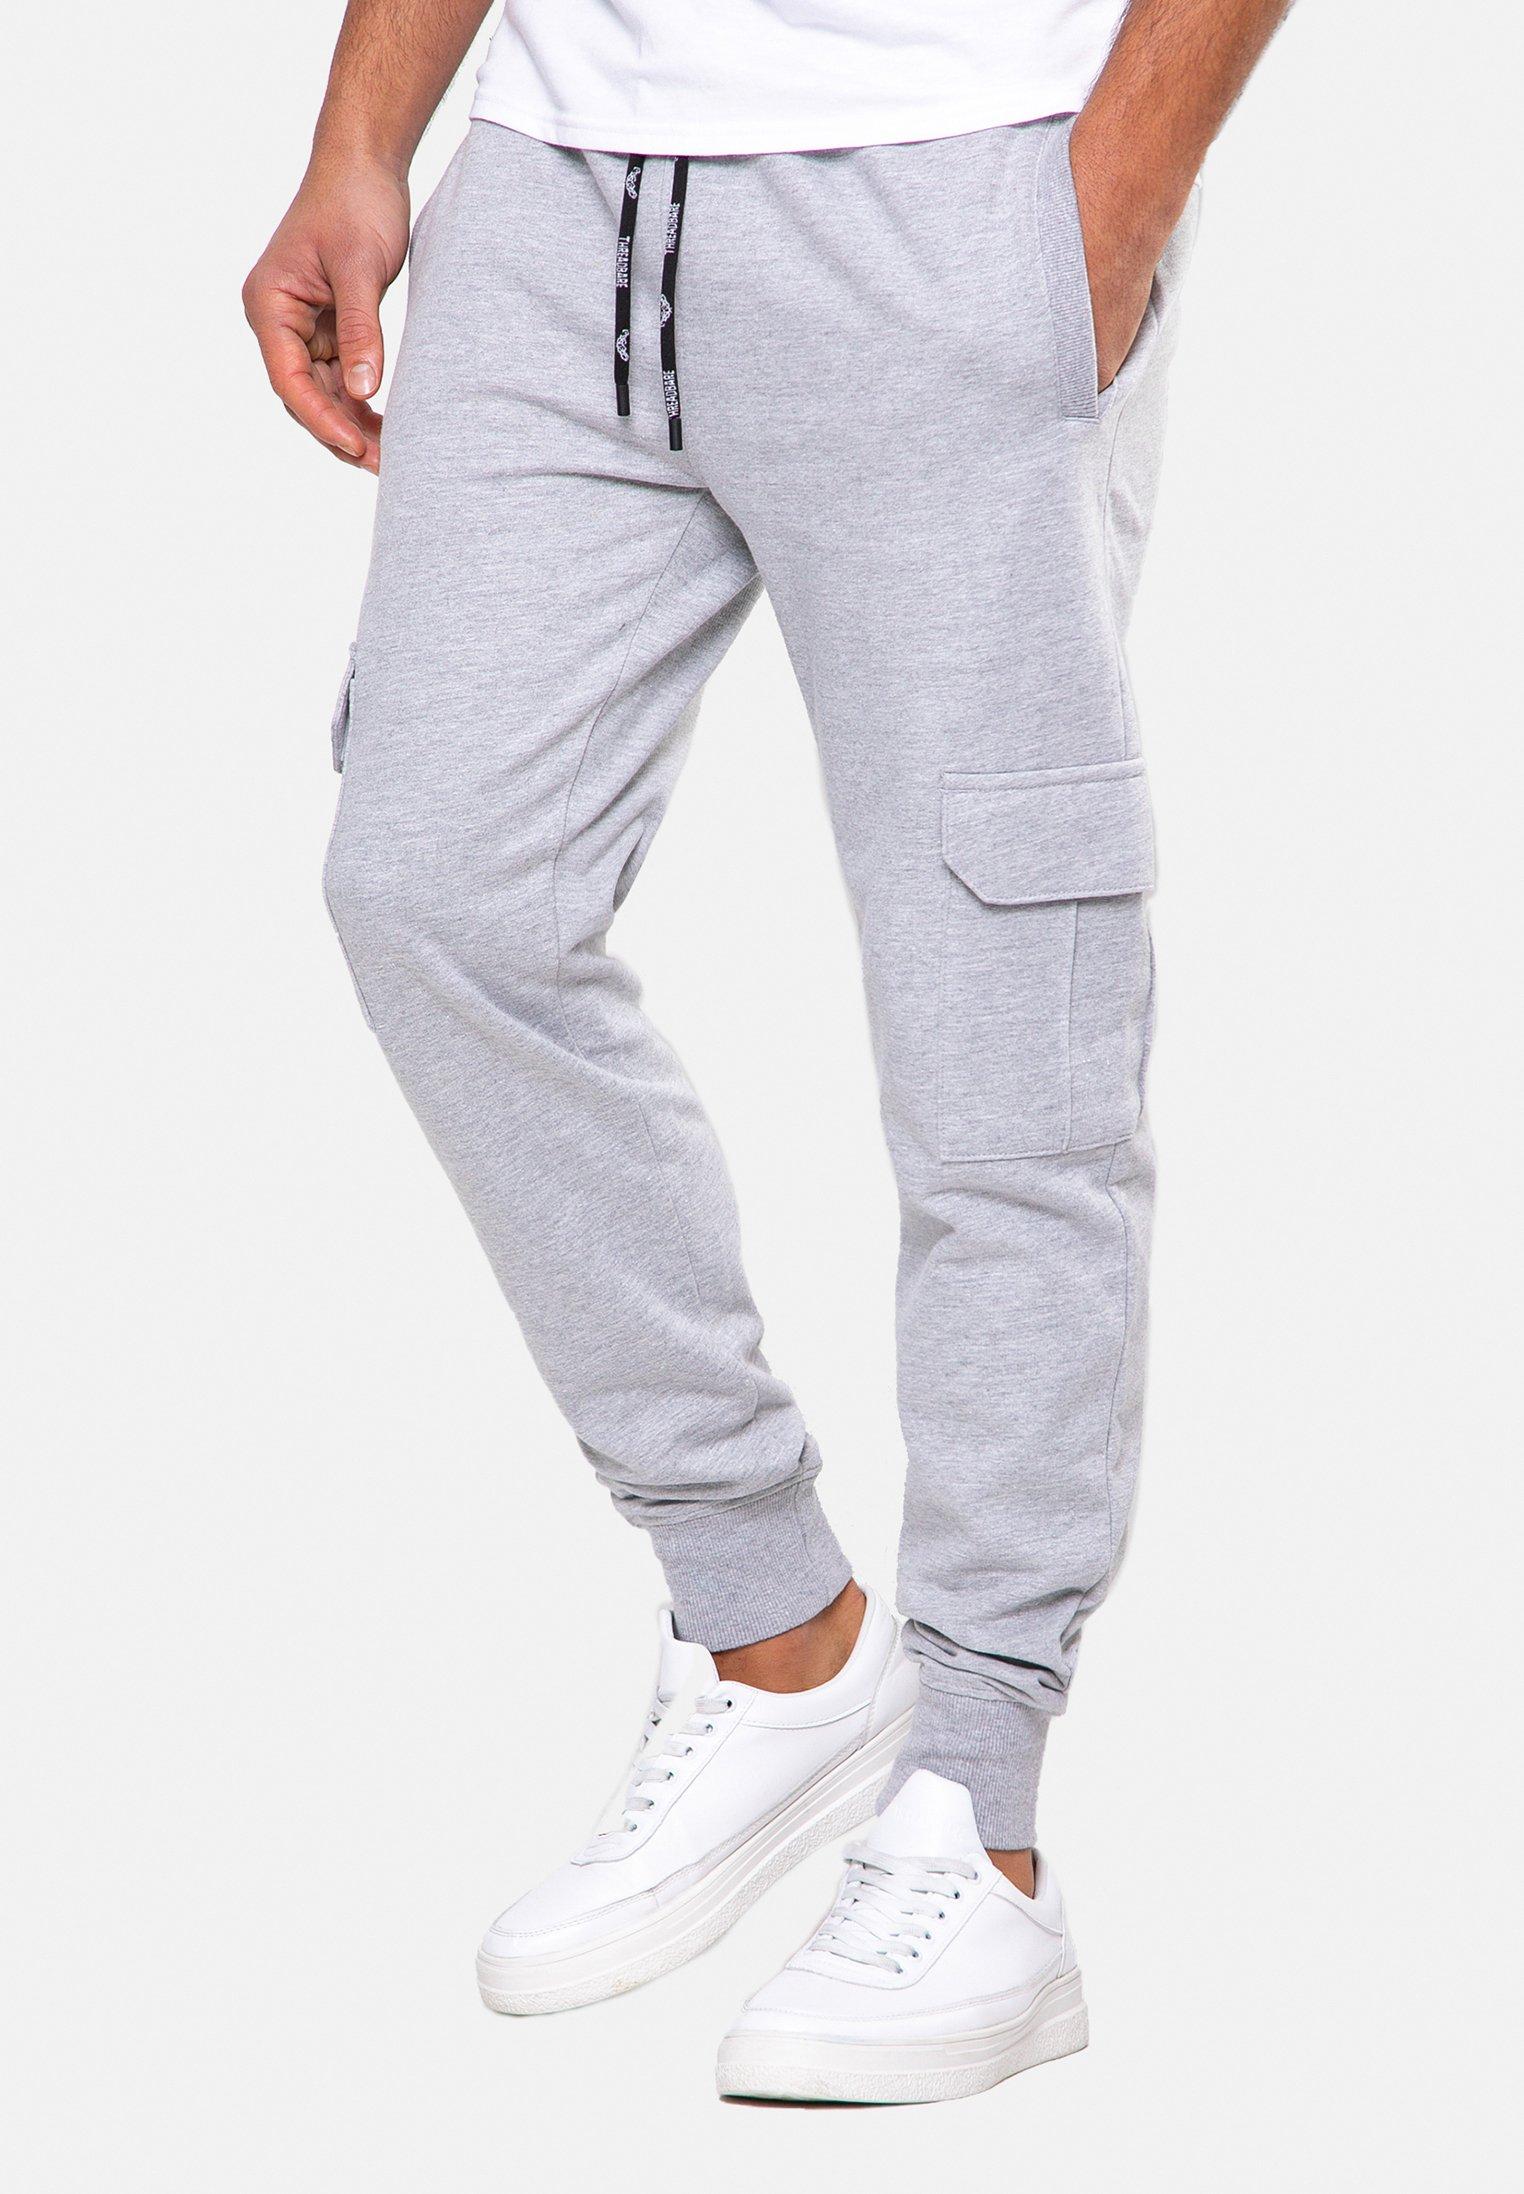 Homme STEFAN - Pantalon cargo